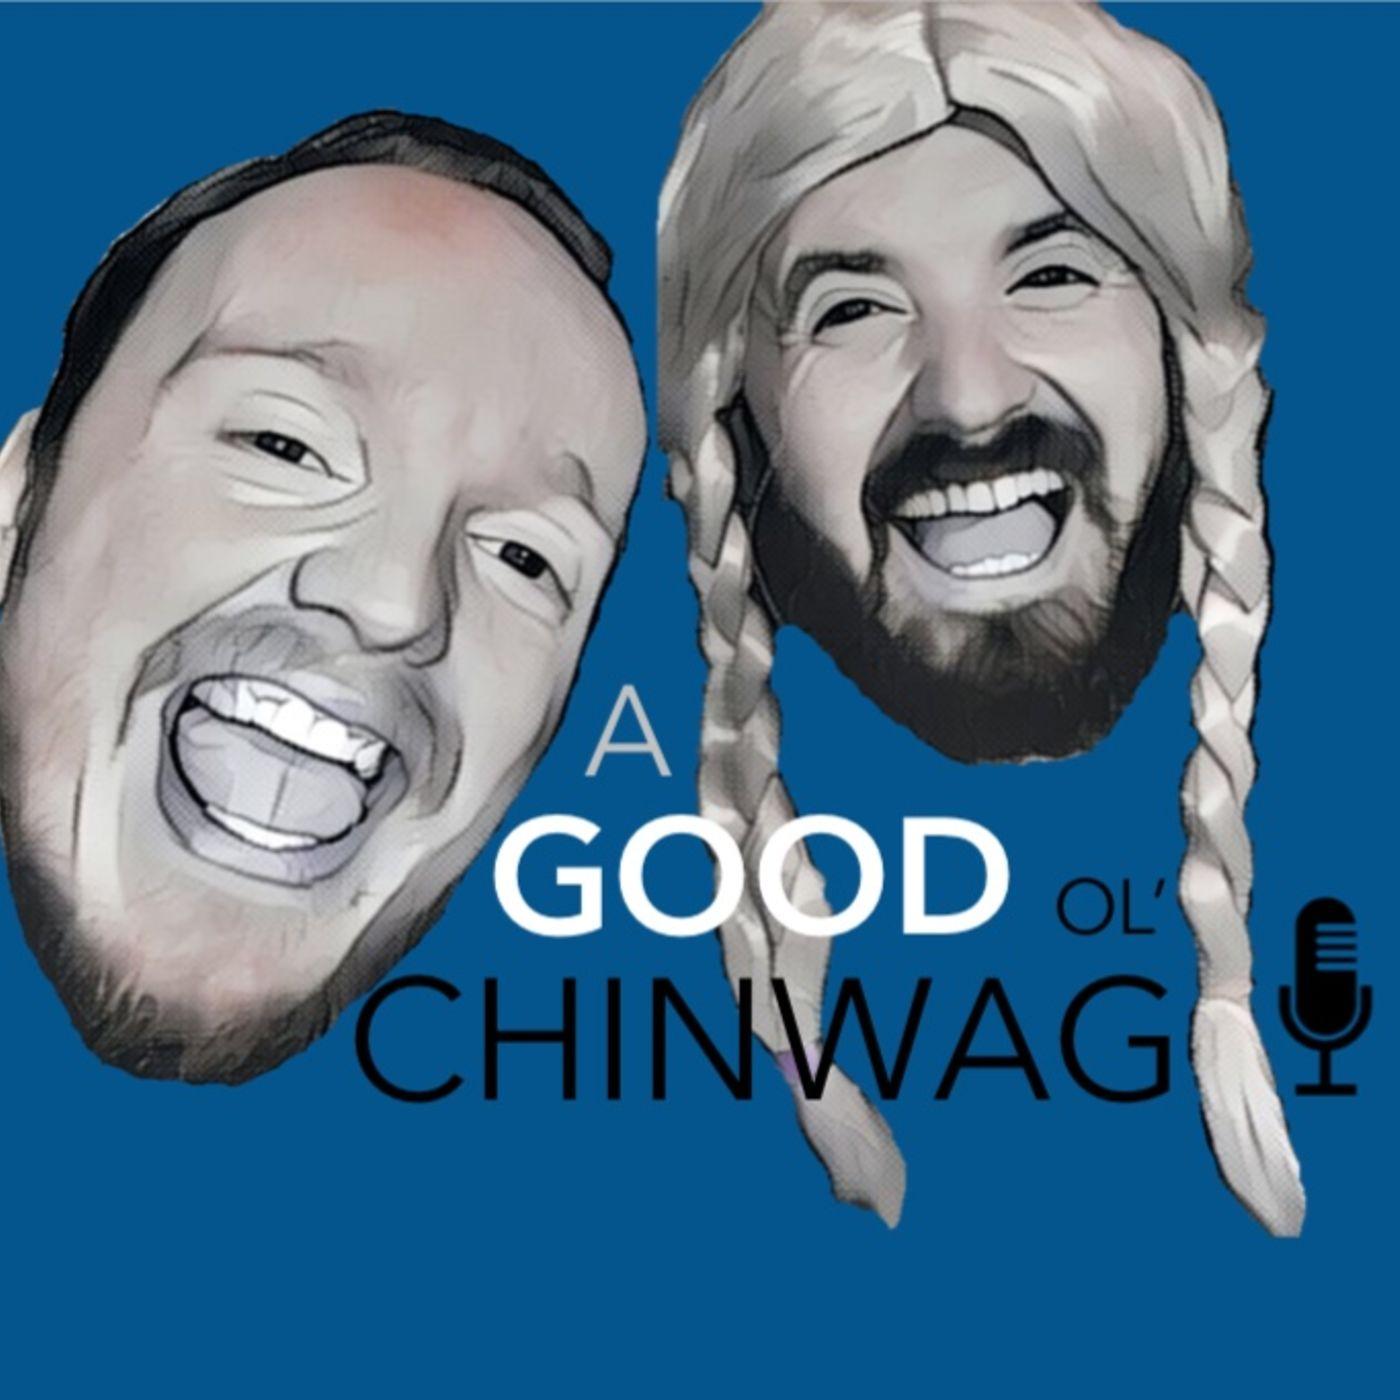 A Good Ol ChinWag's Podcast - Whooshkaa